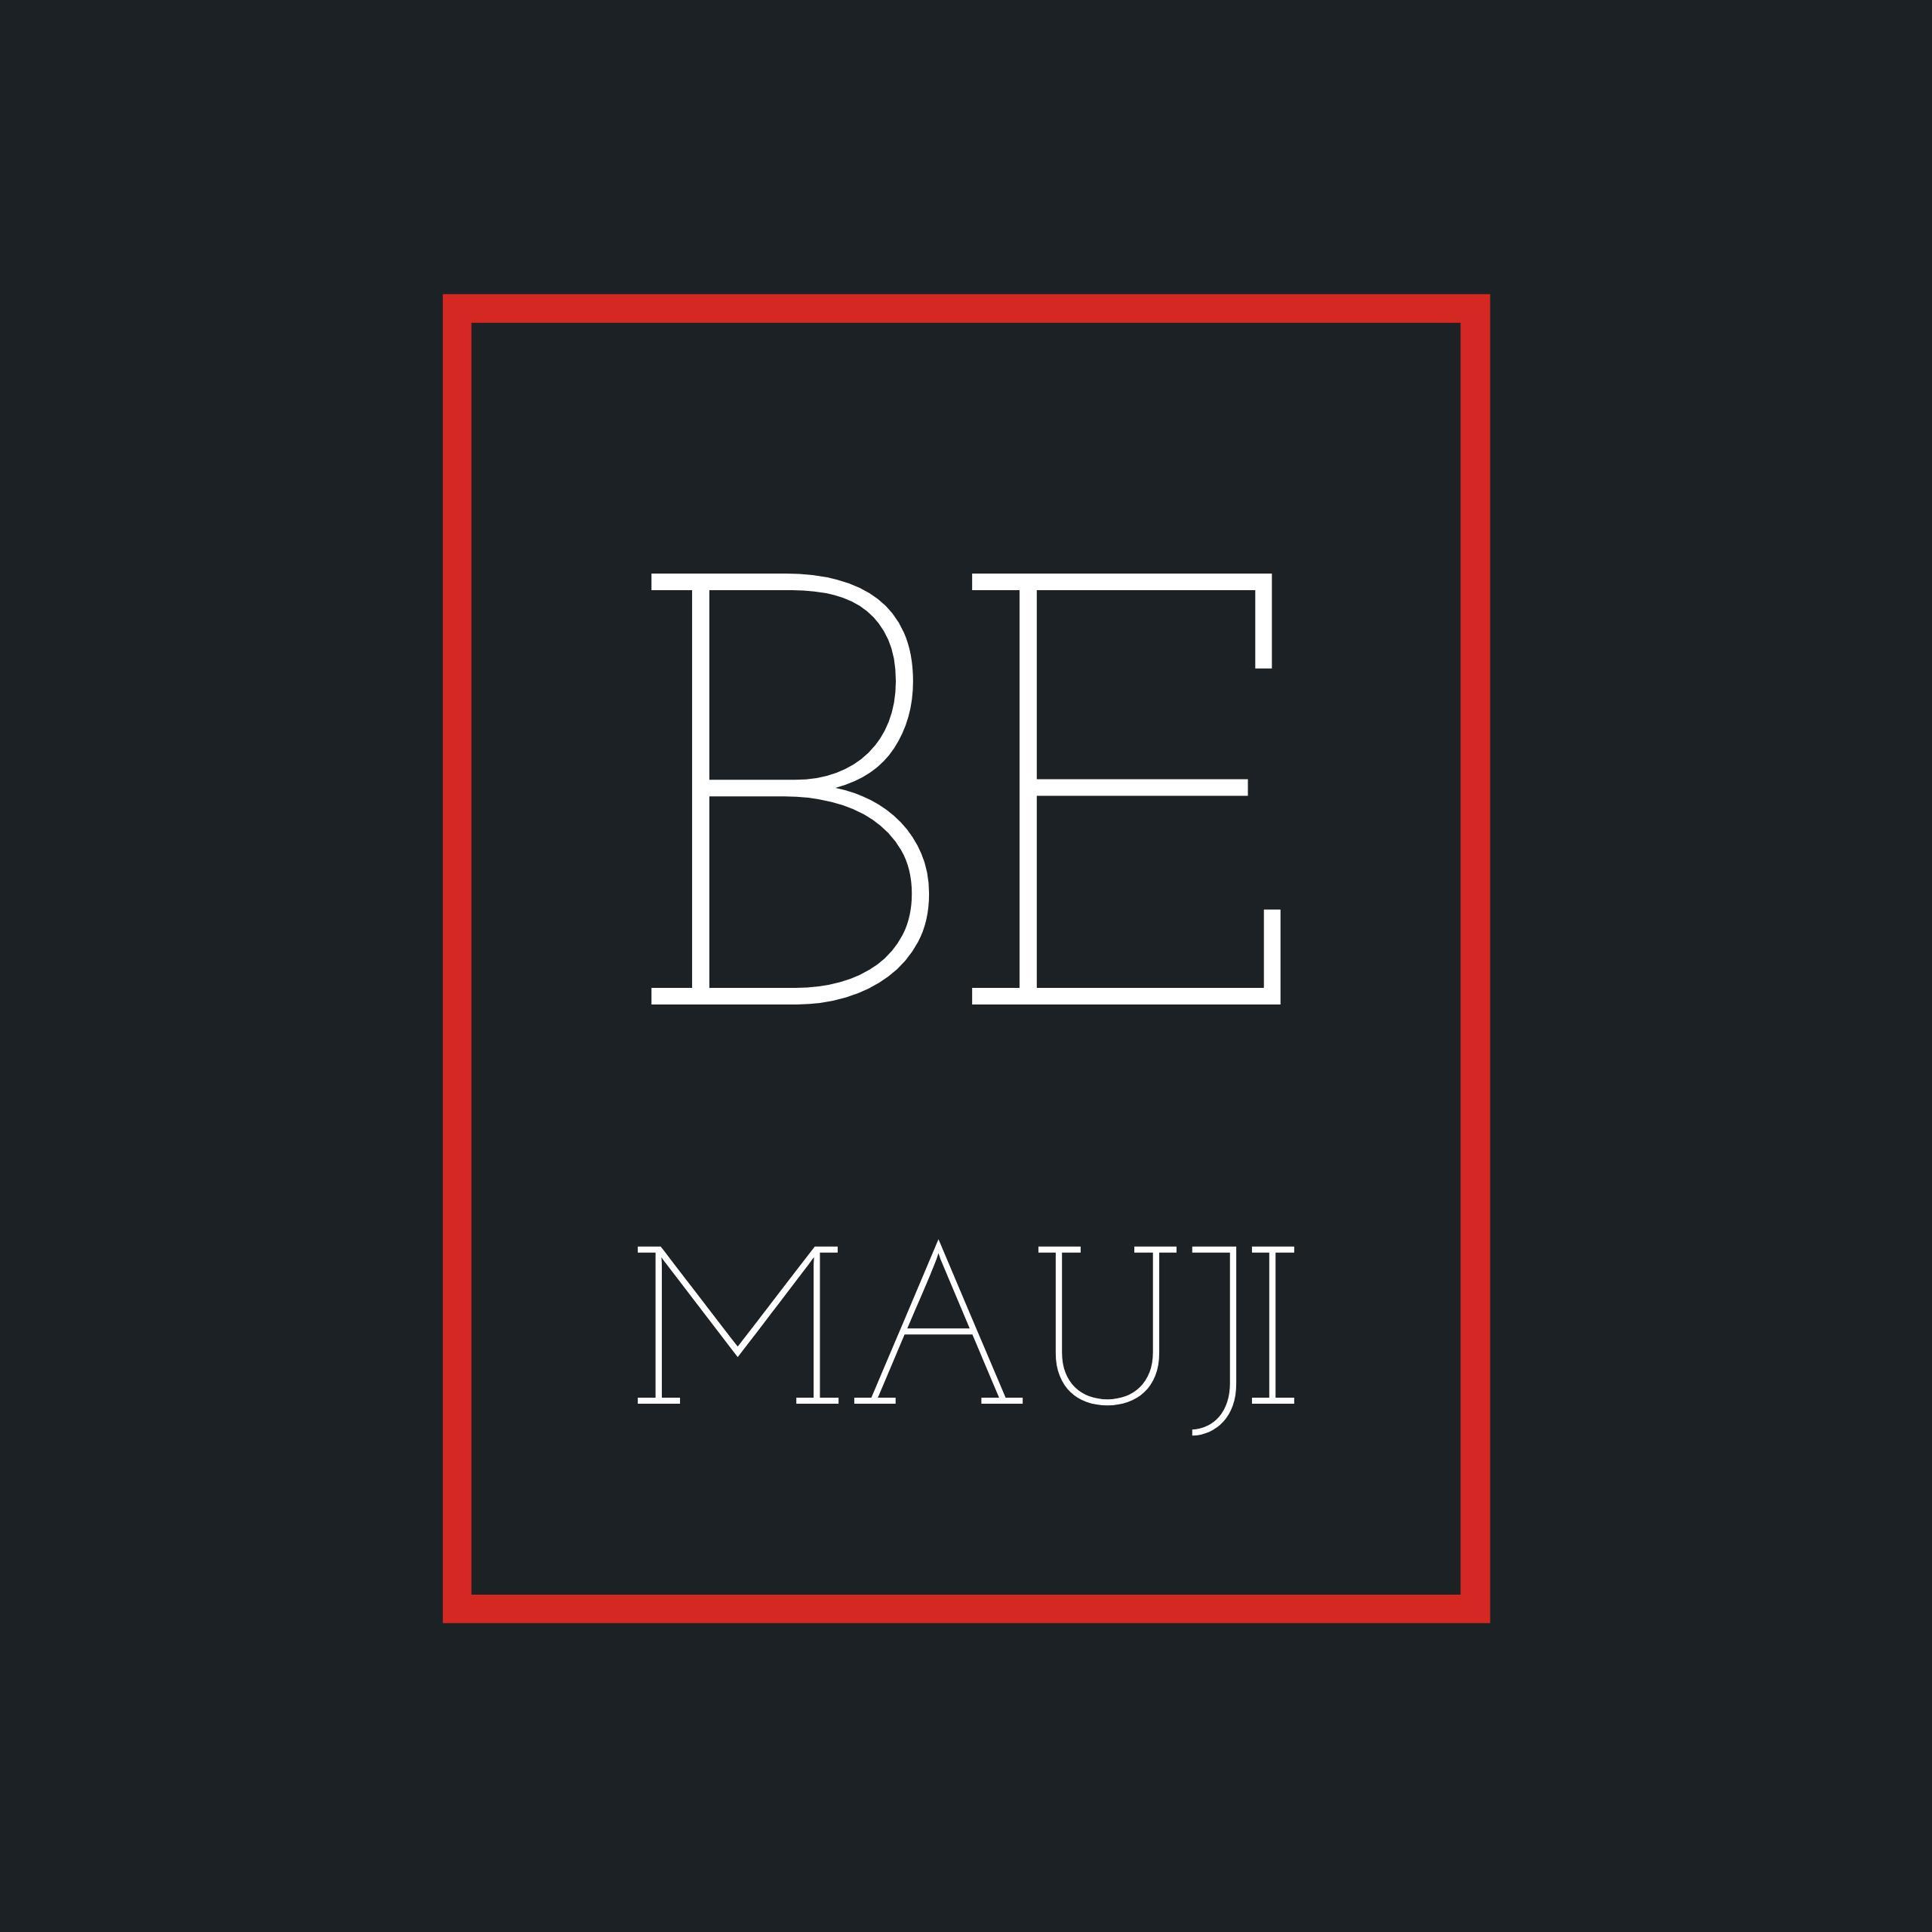 Be Mauji